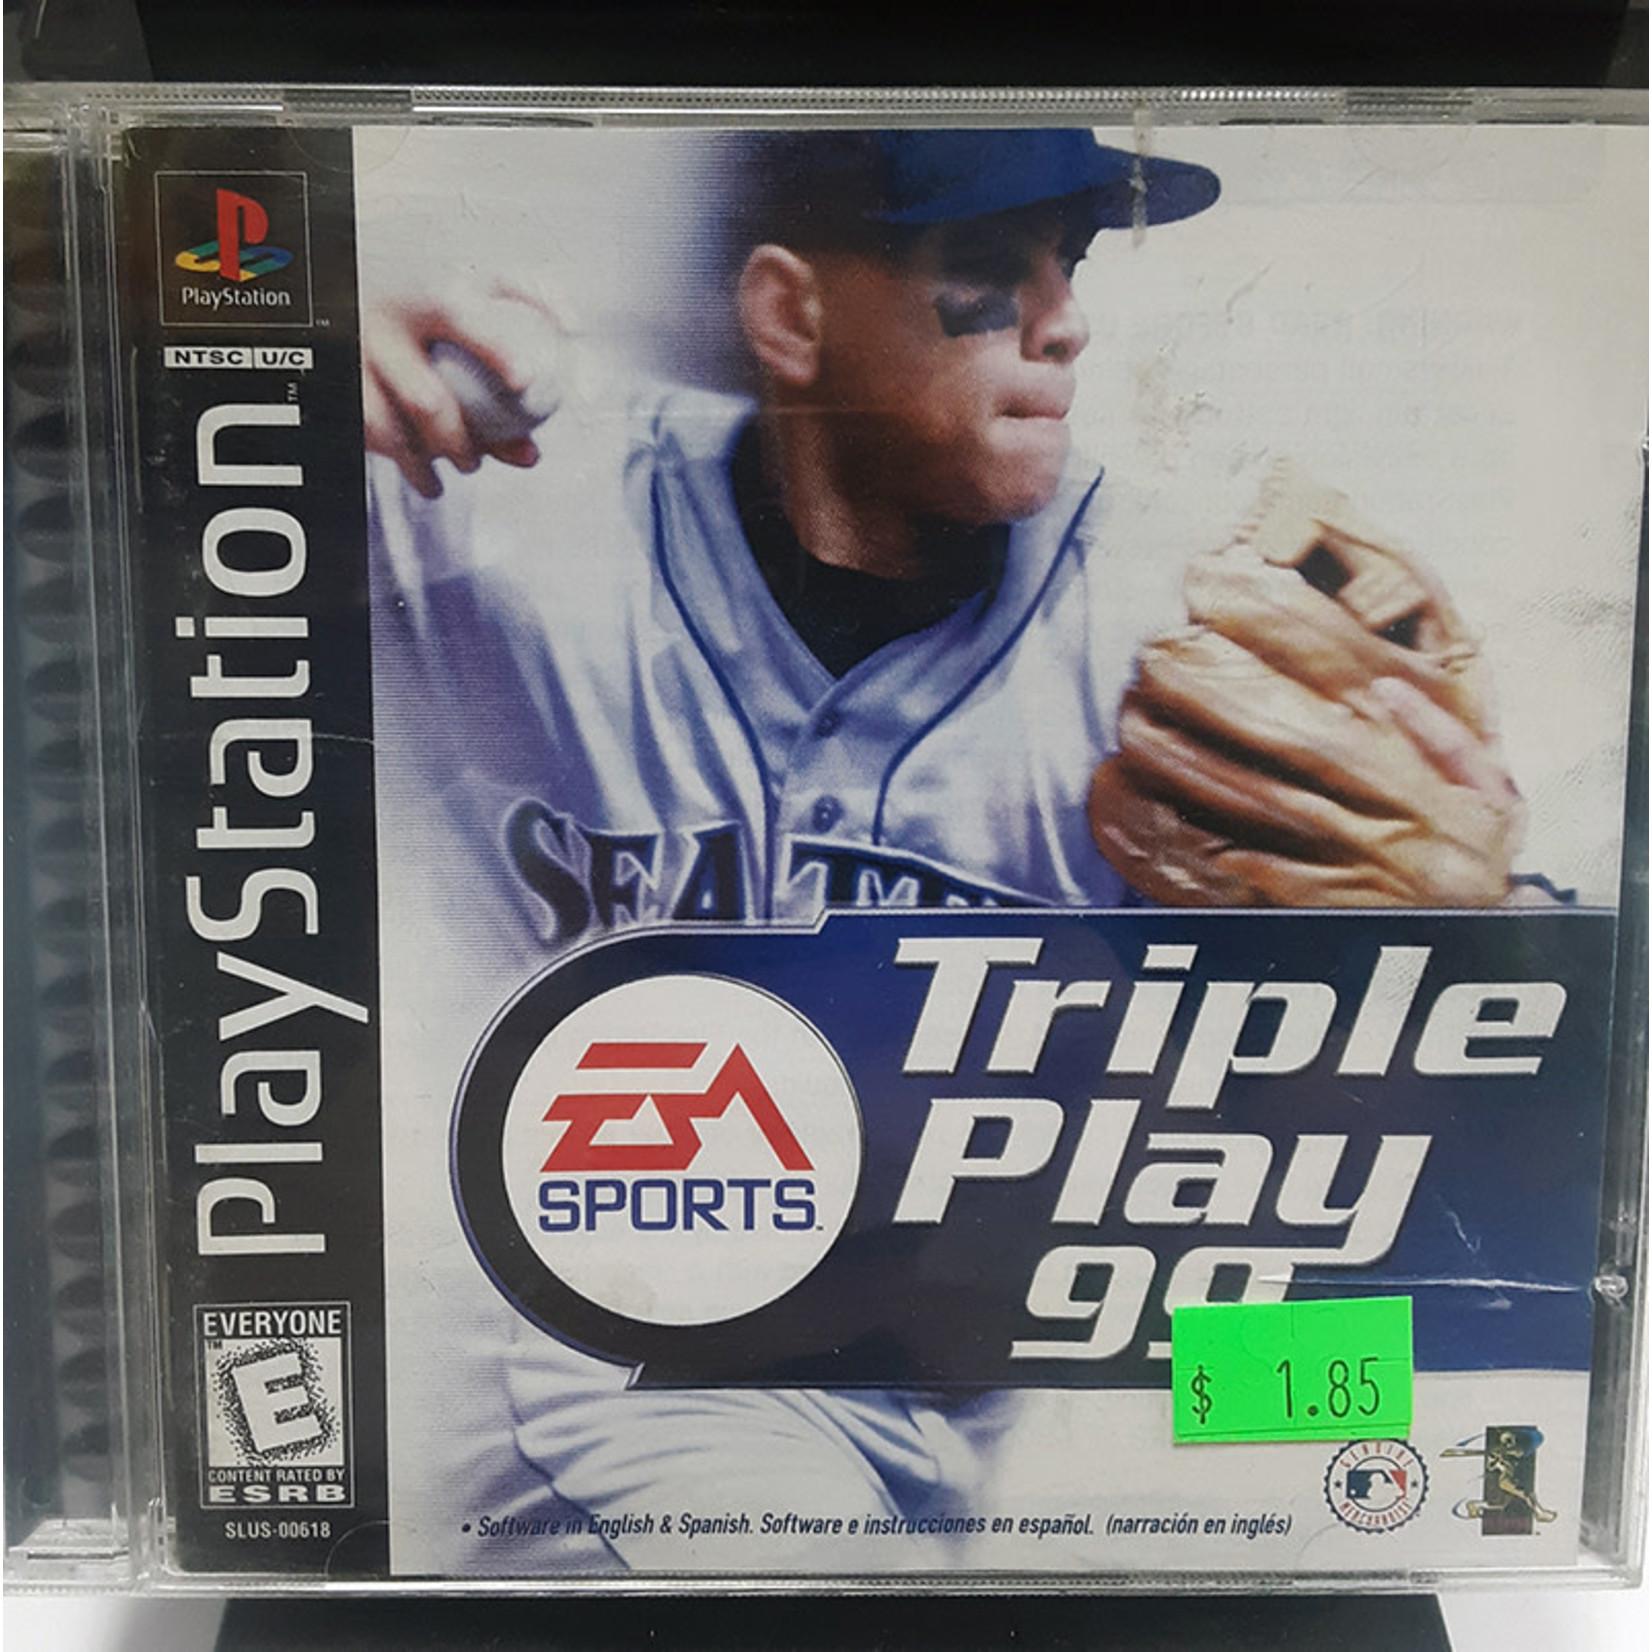 ps1u-Triple Play 99